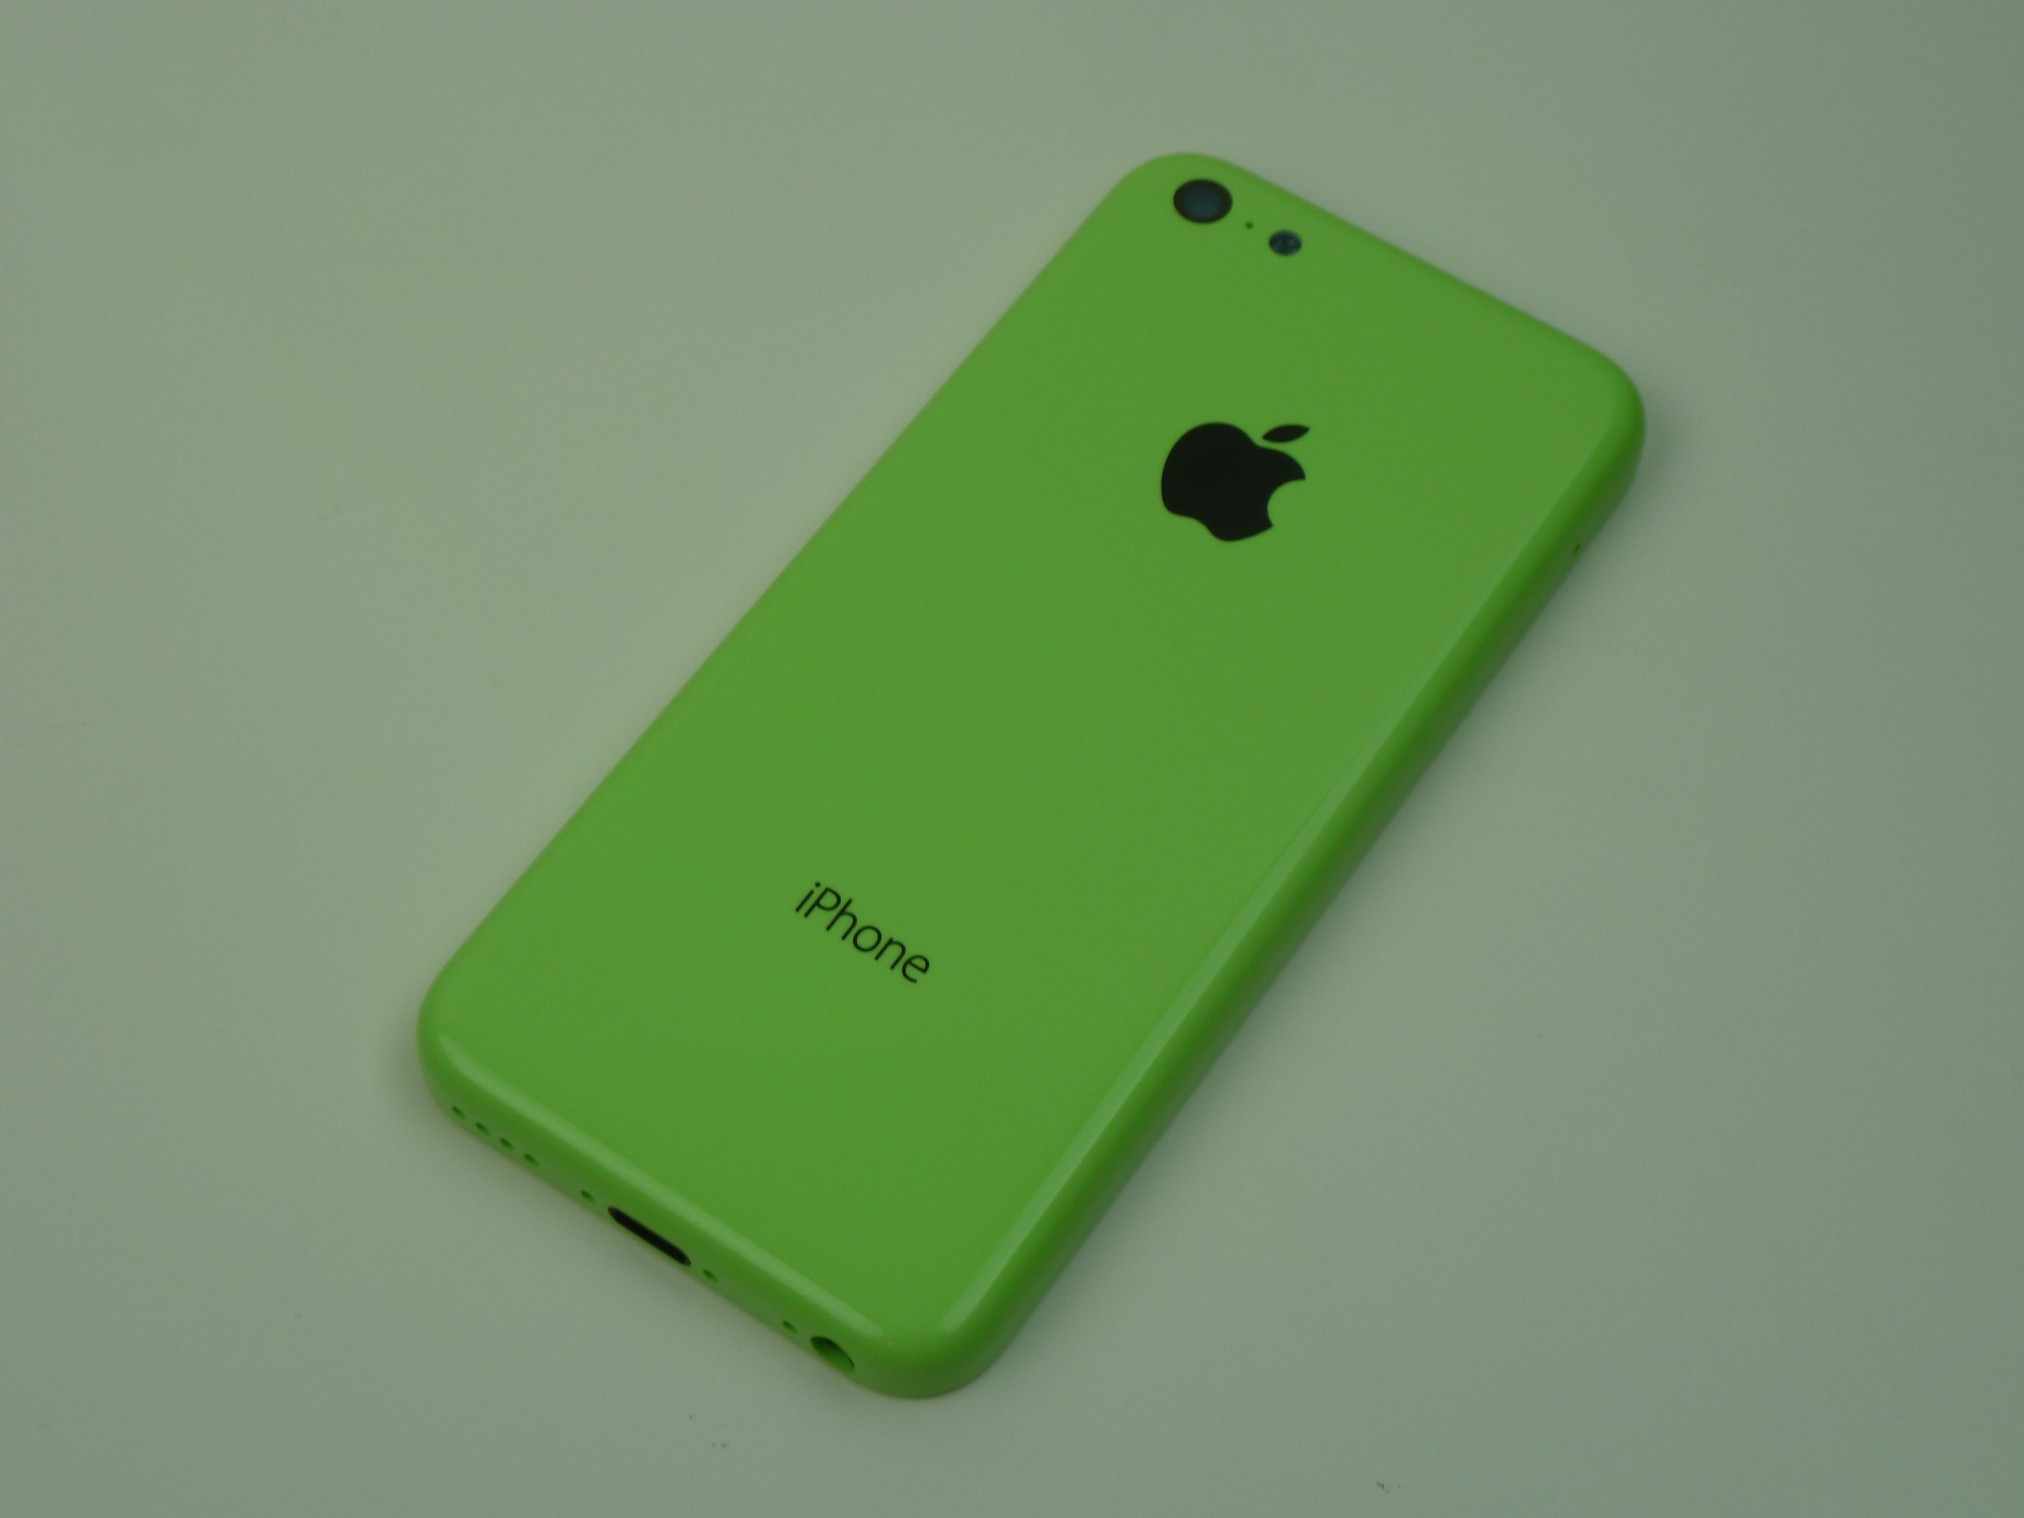 iPhone 5C angle